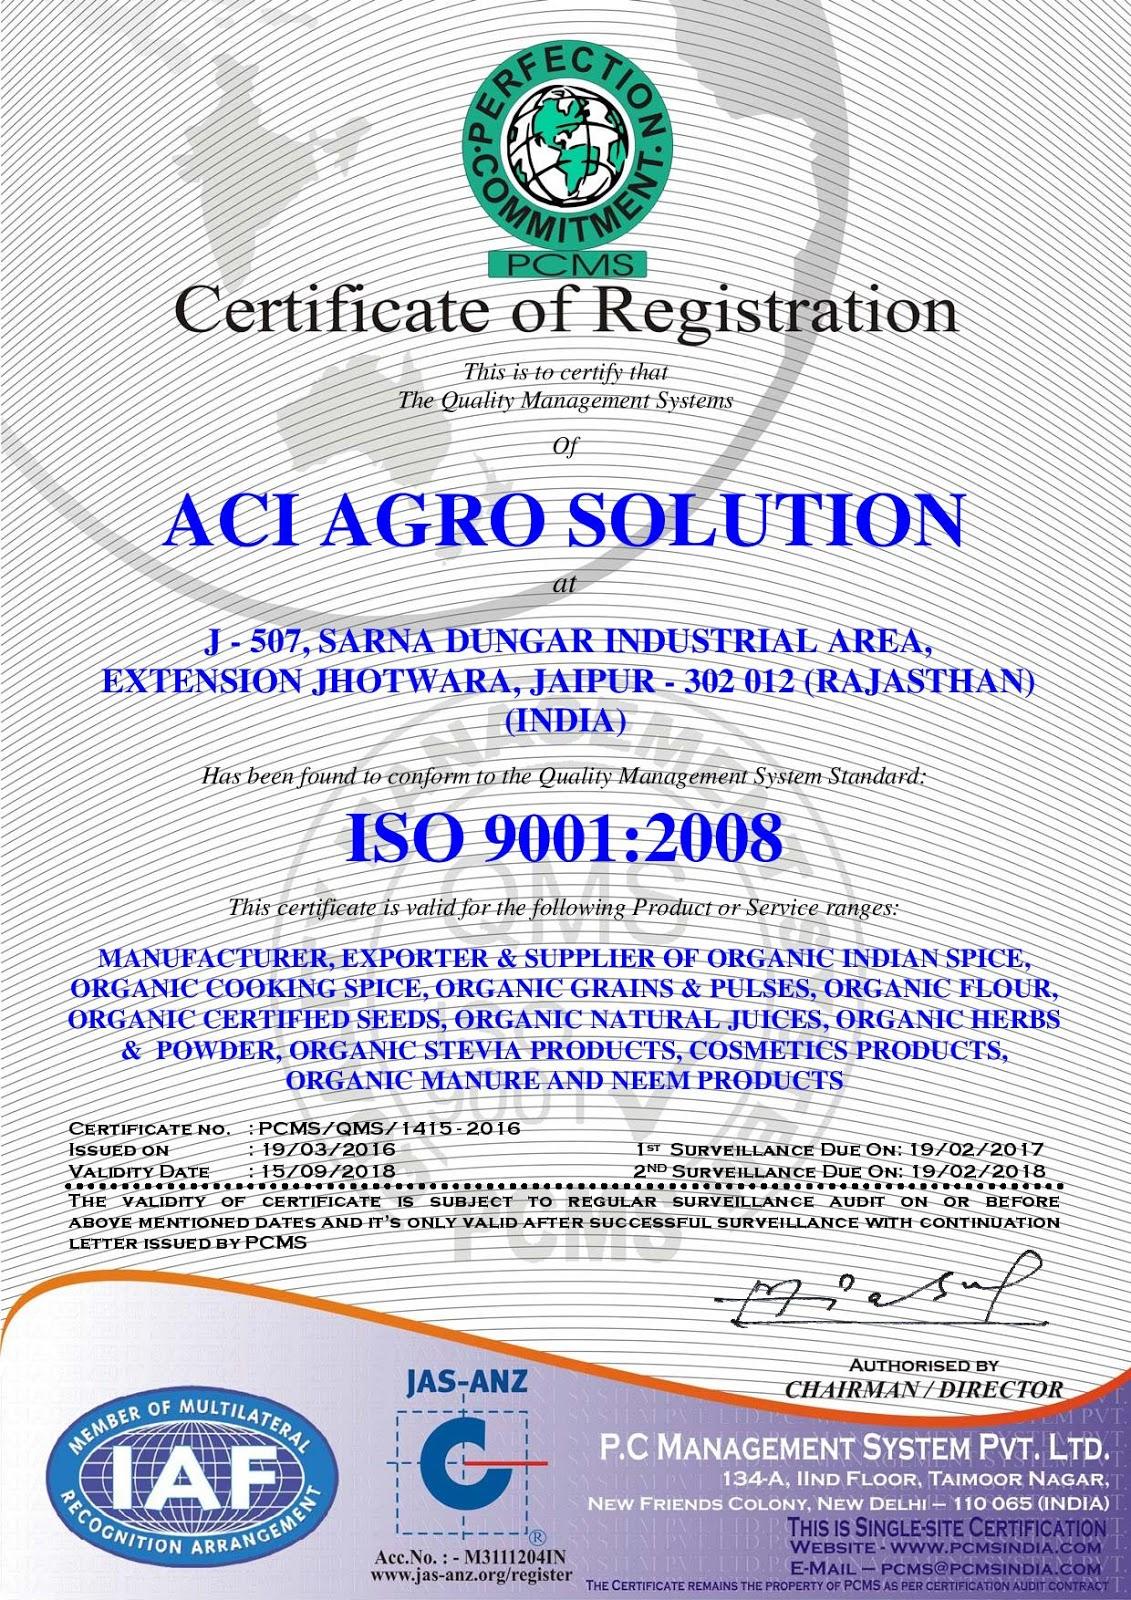 Stevia cultivation aci agro solution certificate aci agro solution xflitez Images